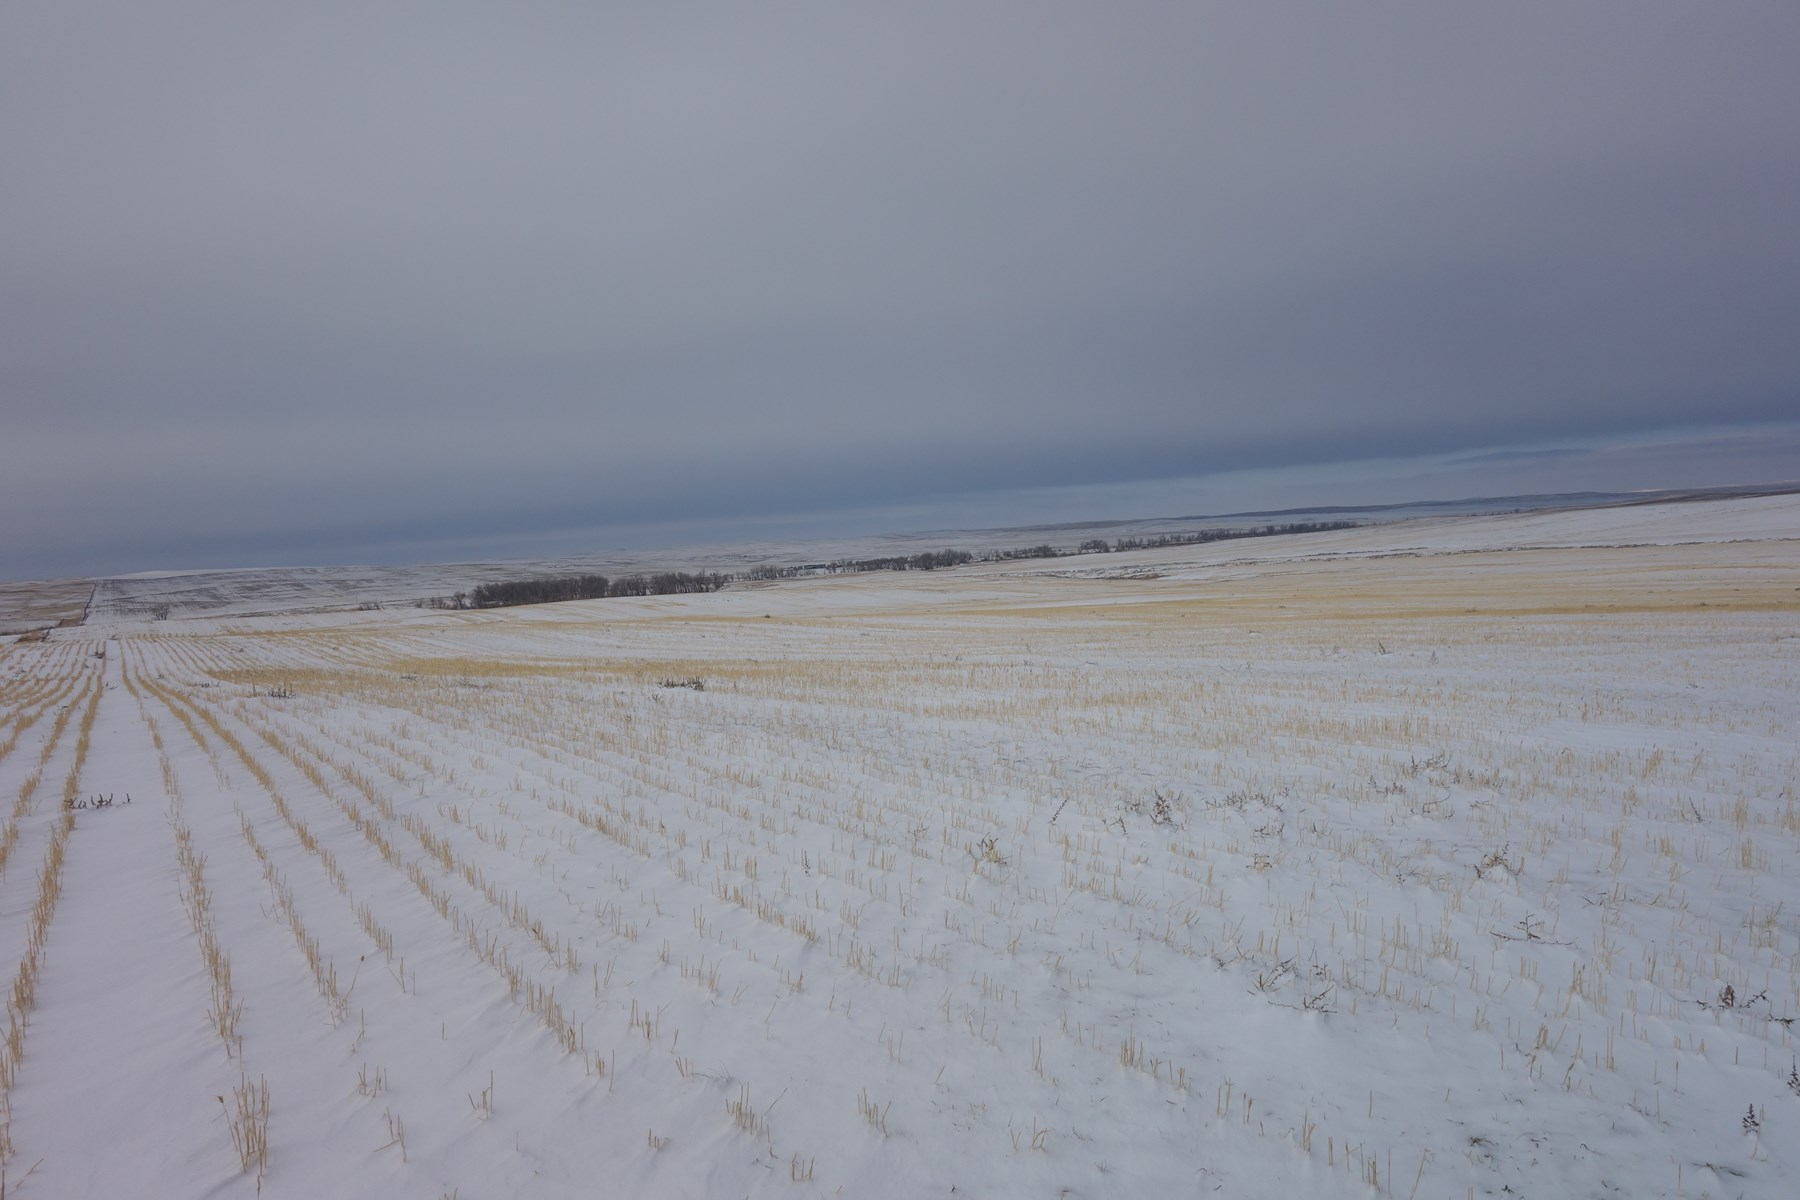 Eastern Montana Mccone County Dryland Farmland For Sale